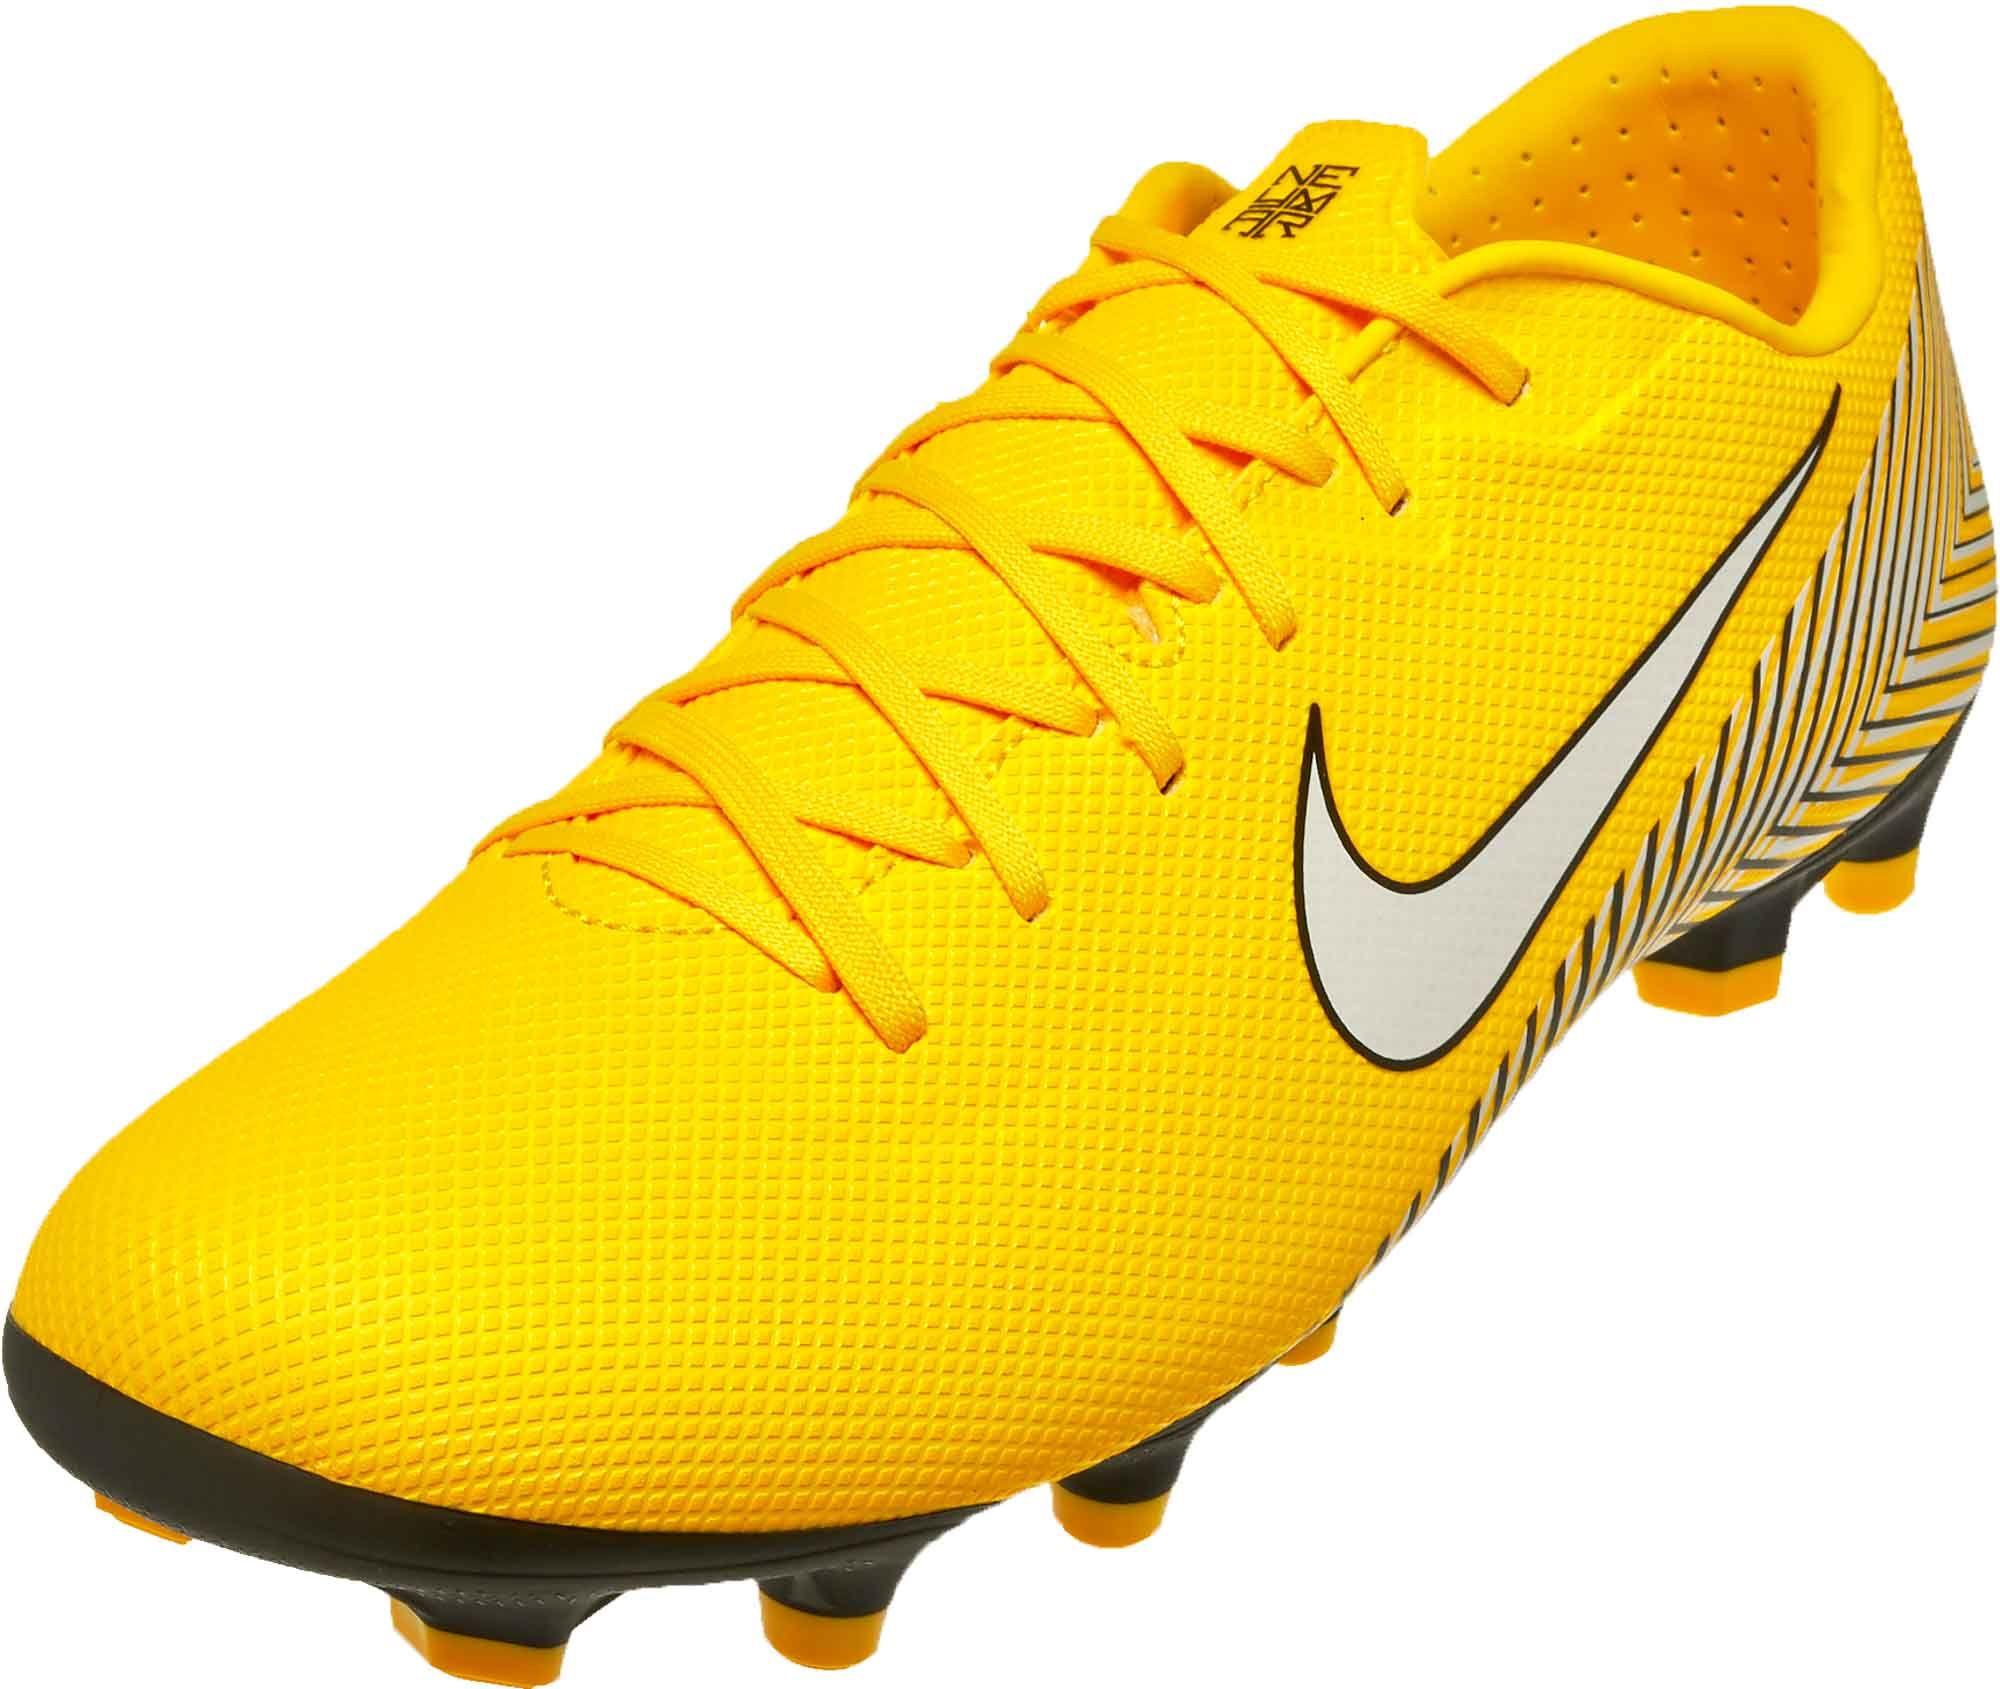 Academy Neymar Mg 12 – AmarillowhiteblackSoccer Nike Vapor PXOkZiu